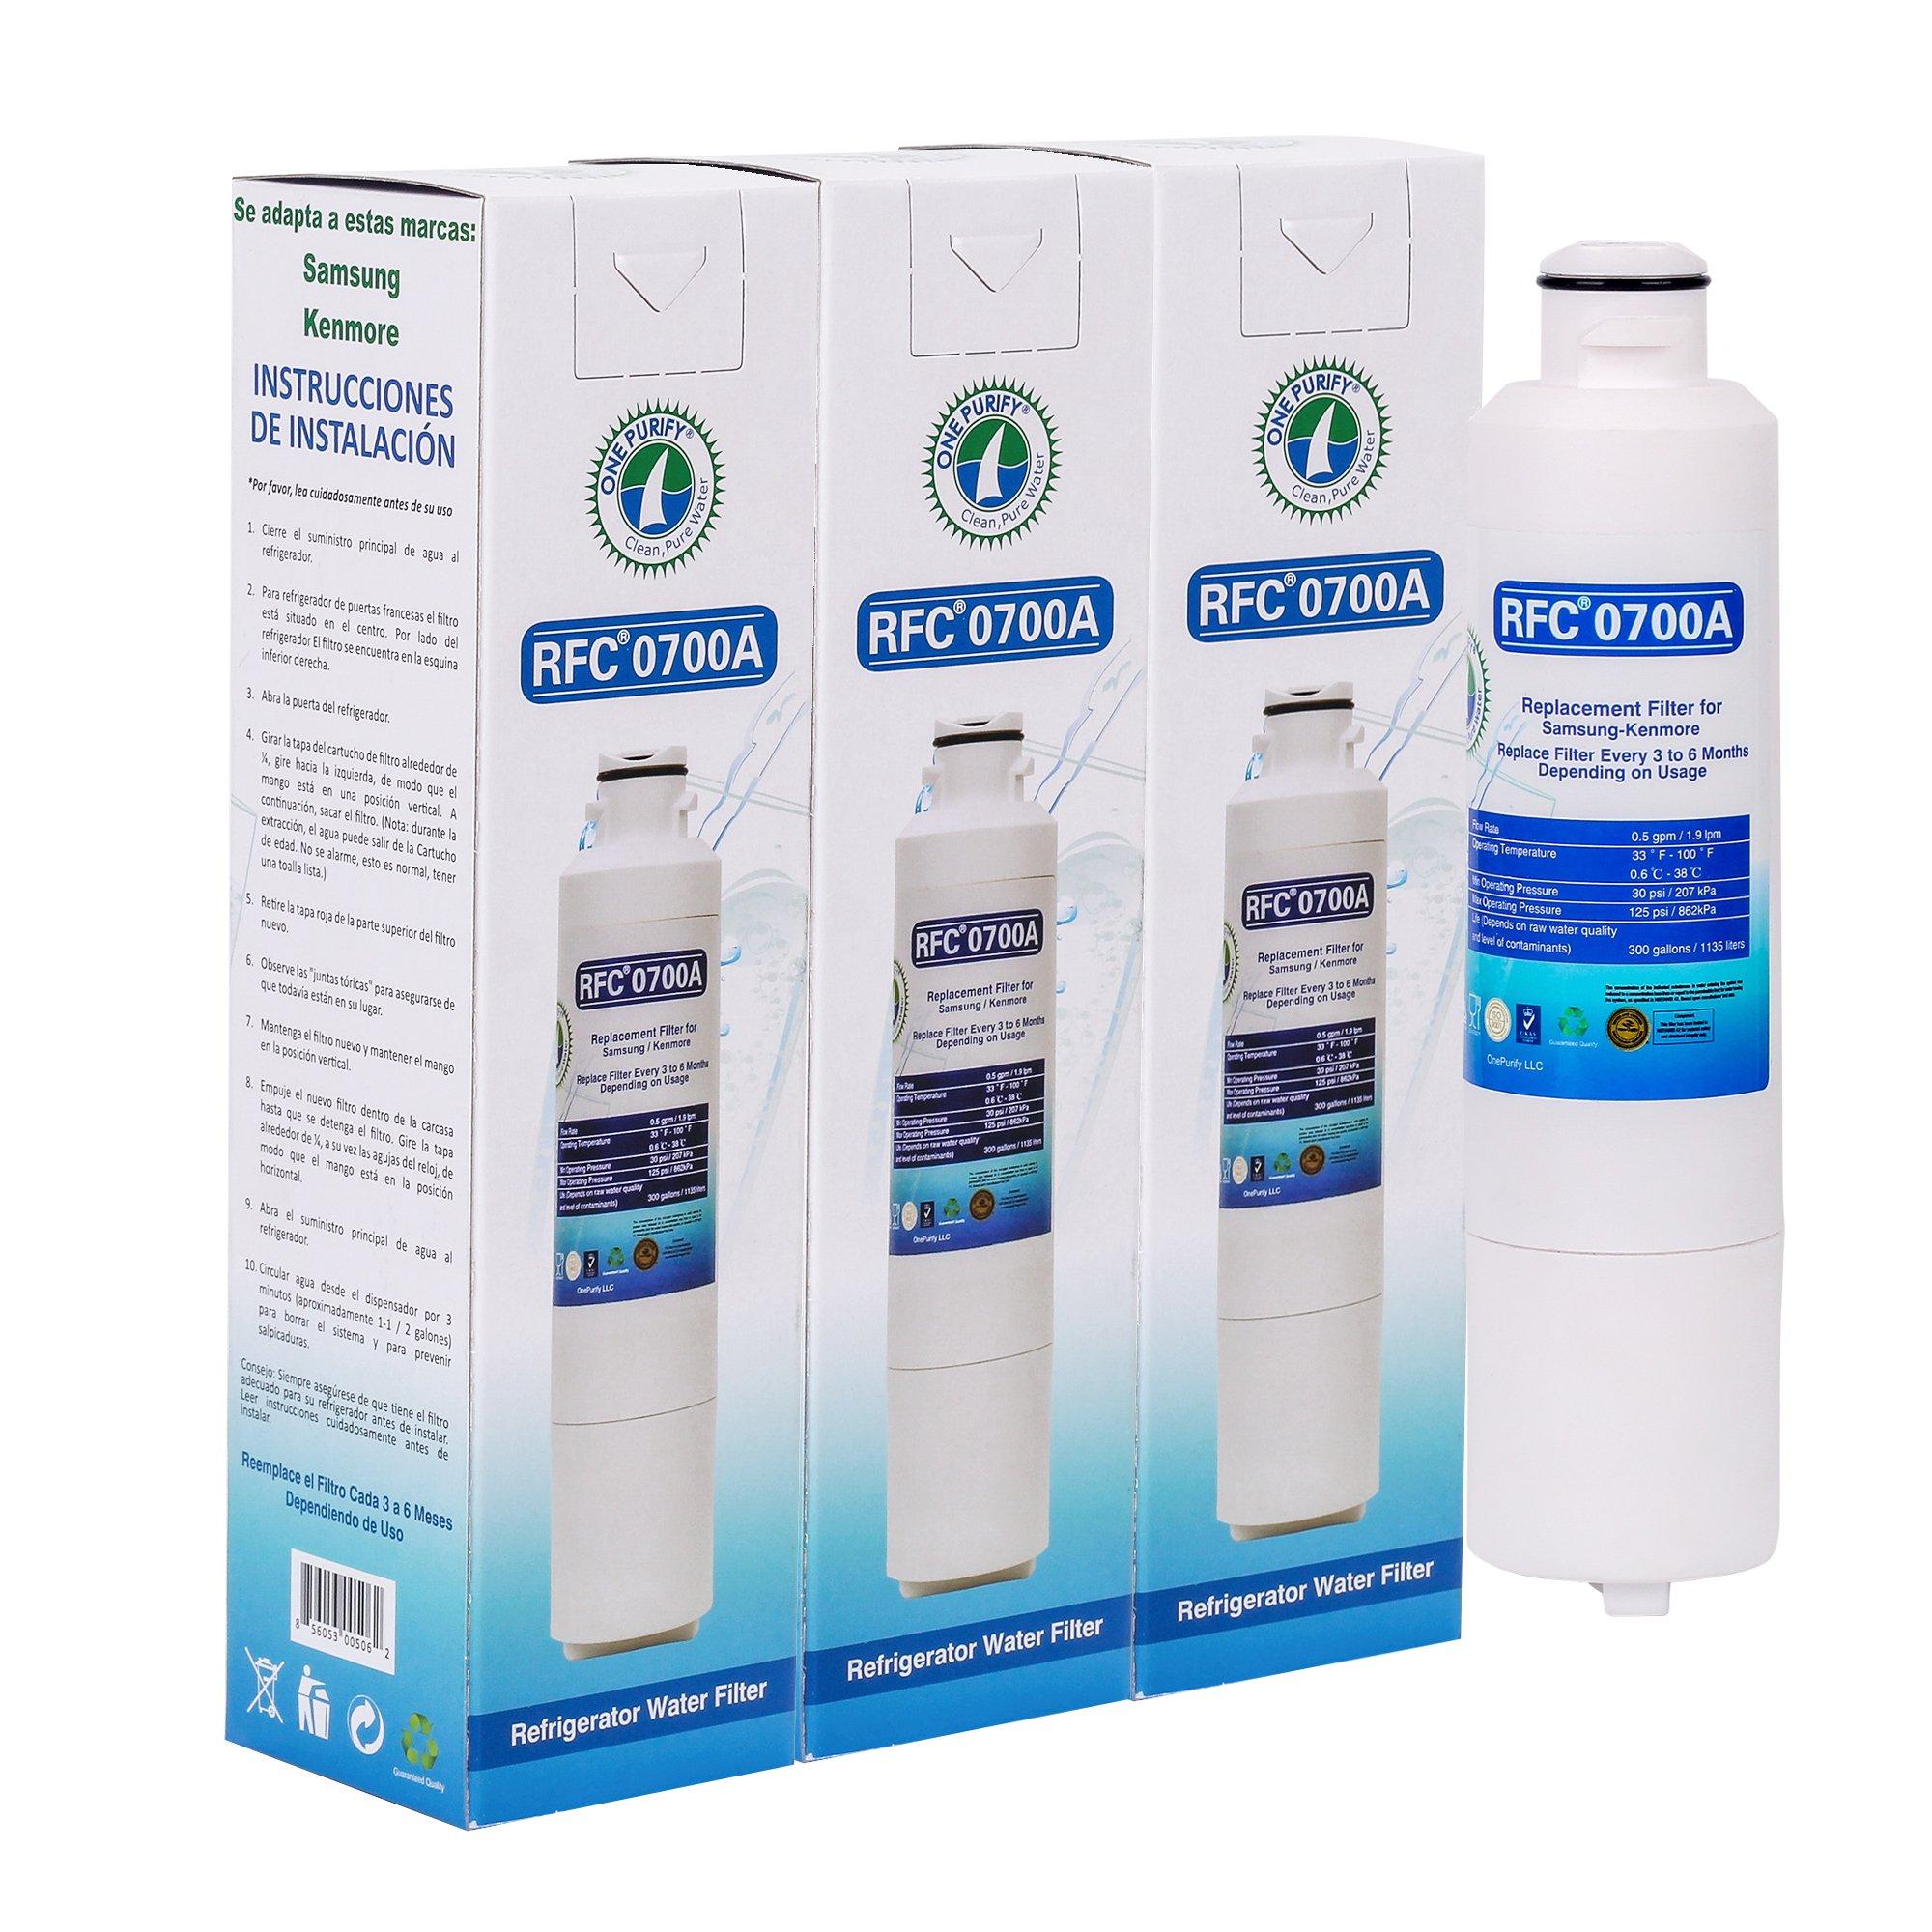 Compatible Replacement for Samsung DA29-00020B, DA29-00020A, DA2900019A, HAF-CIN/EXP, HAF-CIN-EXP, Kenmore 46-9101 Refrigerator Water Filter Cartridge by OnePurify RFC0700A 3PK